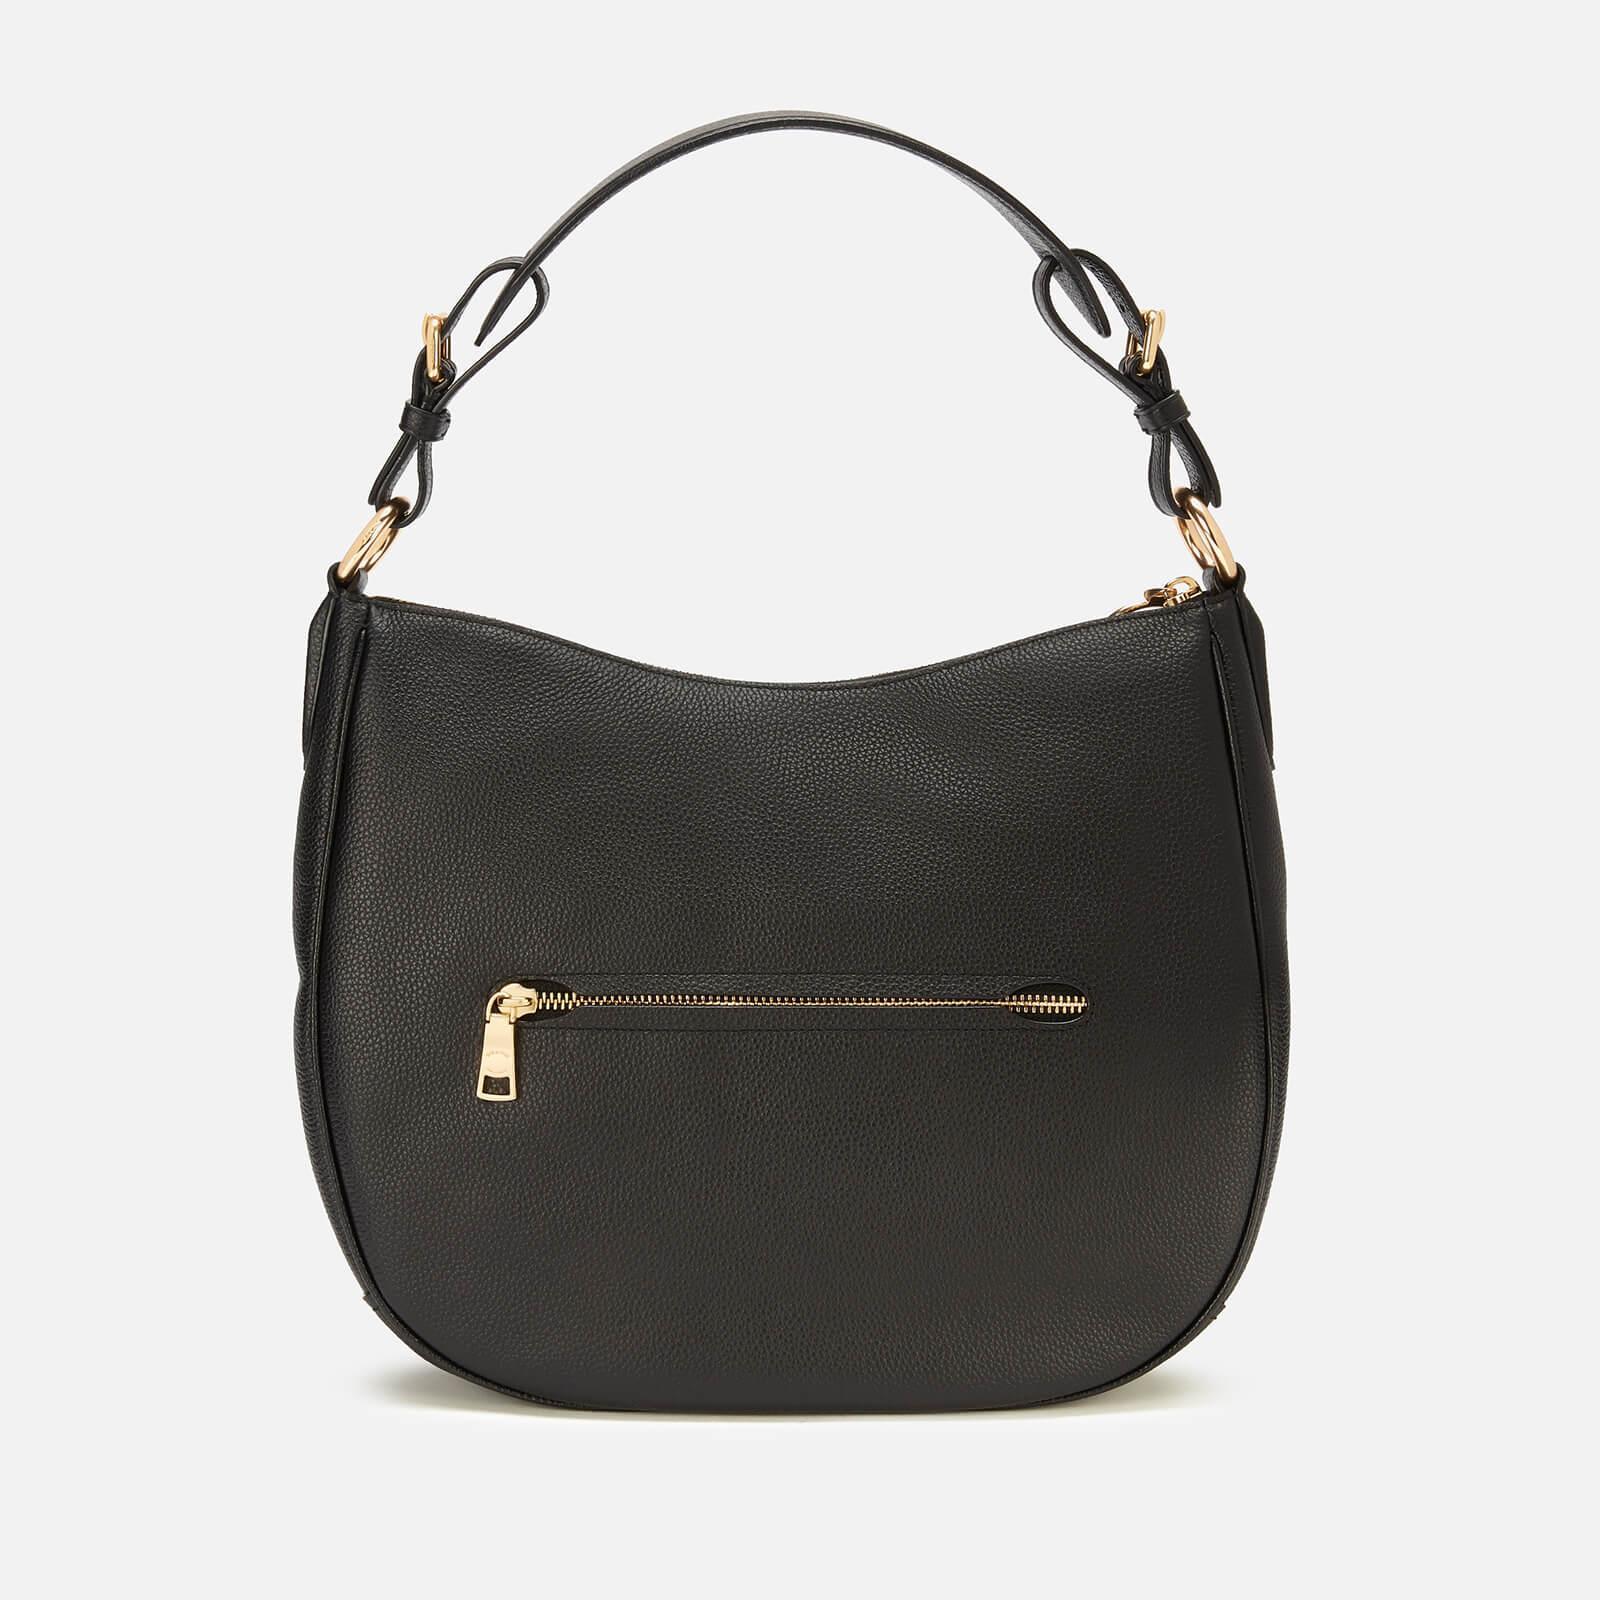 bc941ab78749 COACH - Black Polished Pebble Leather Sutton Hobo Bag - Lyst. View  fullscreen